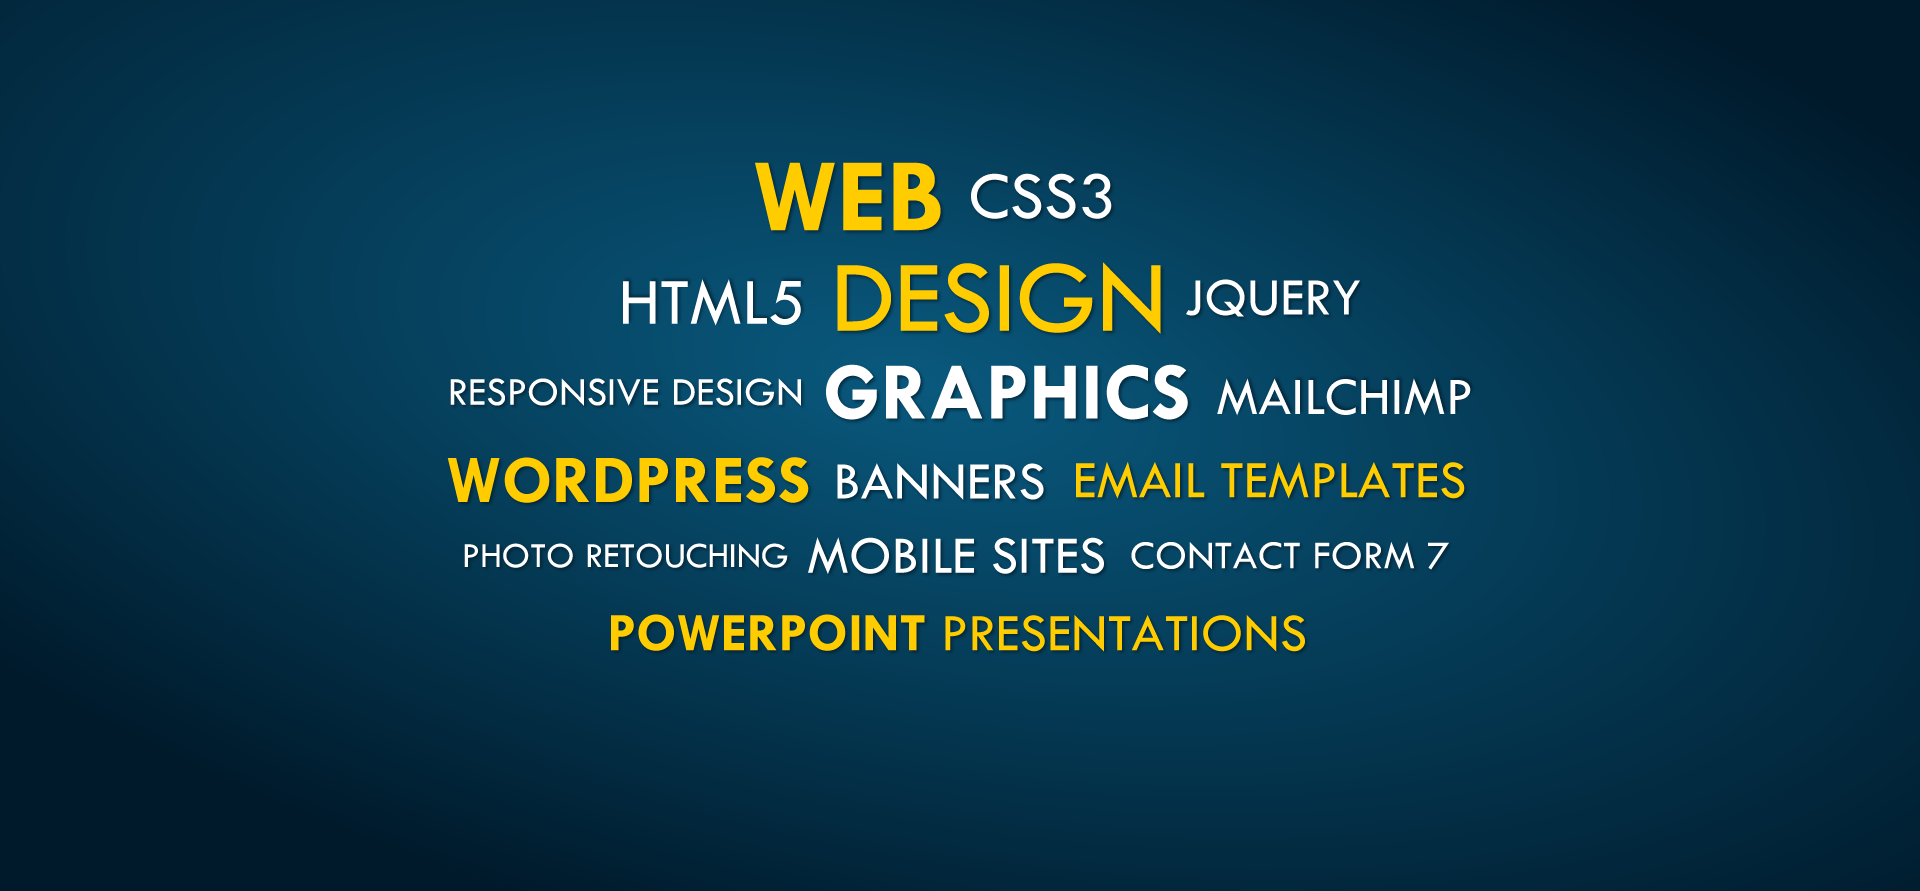 web design expert wordpress theme and mailchimp template superstar